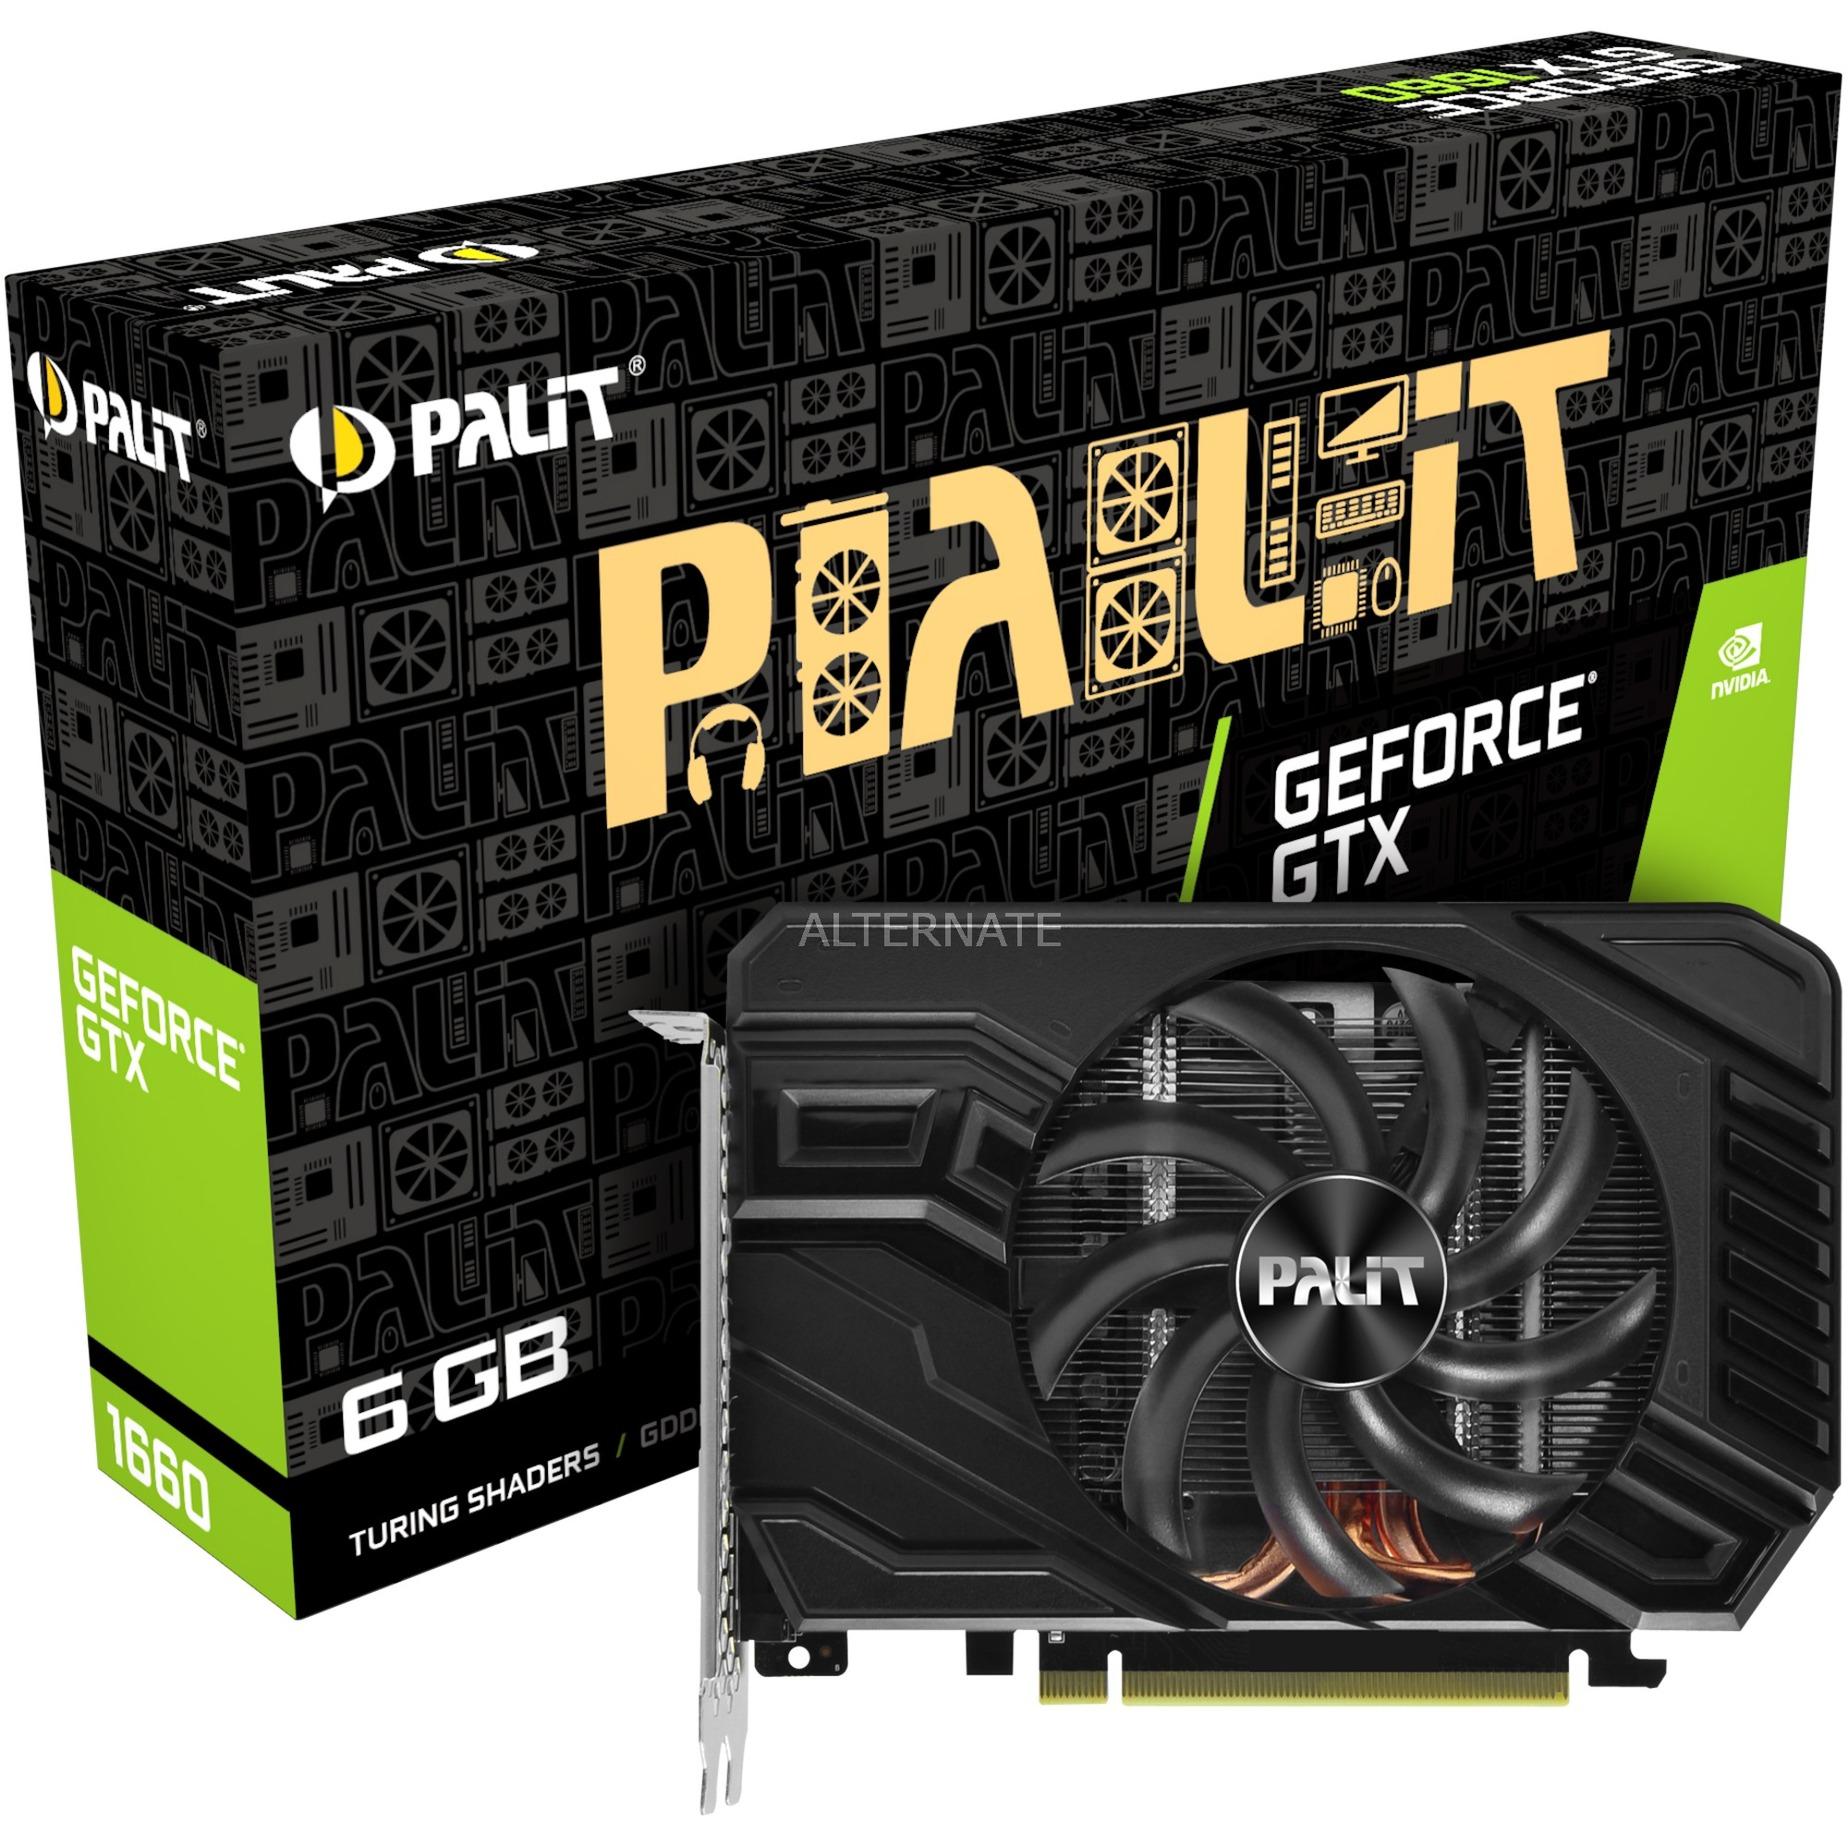 NE51660018J9-165F tarjeta gráfica GeForce GTX 1660 6 GB GDDR5